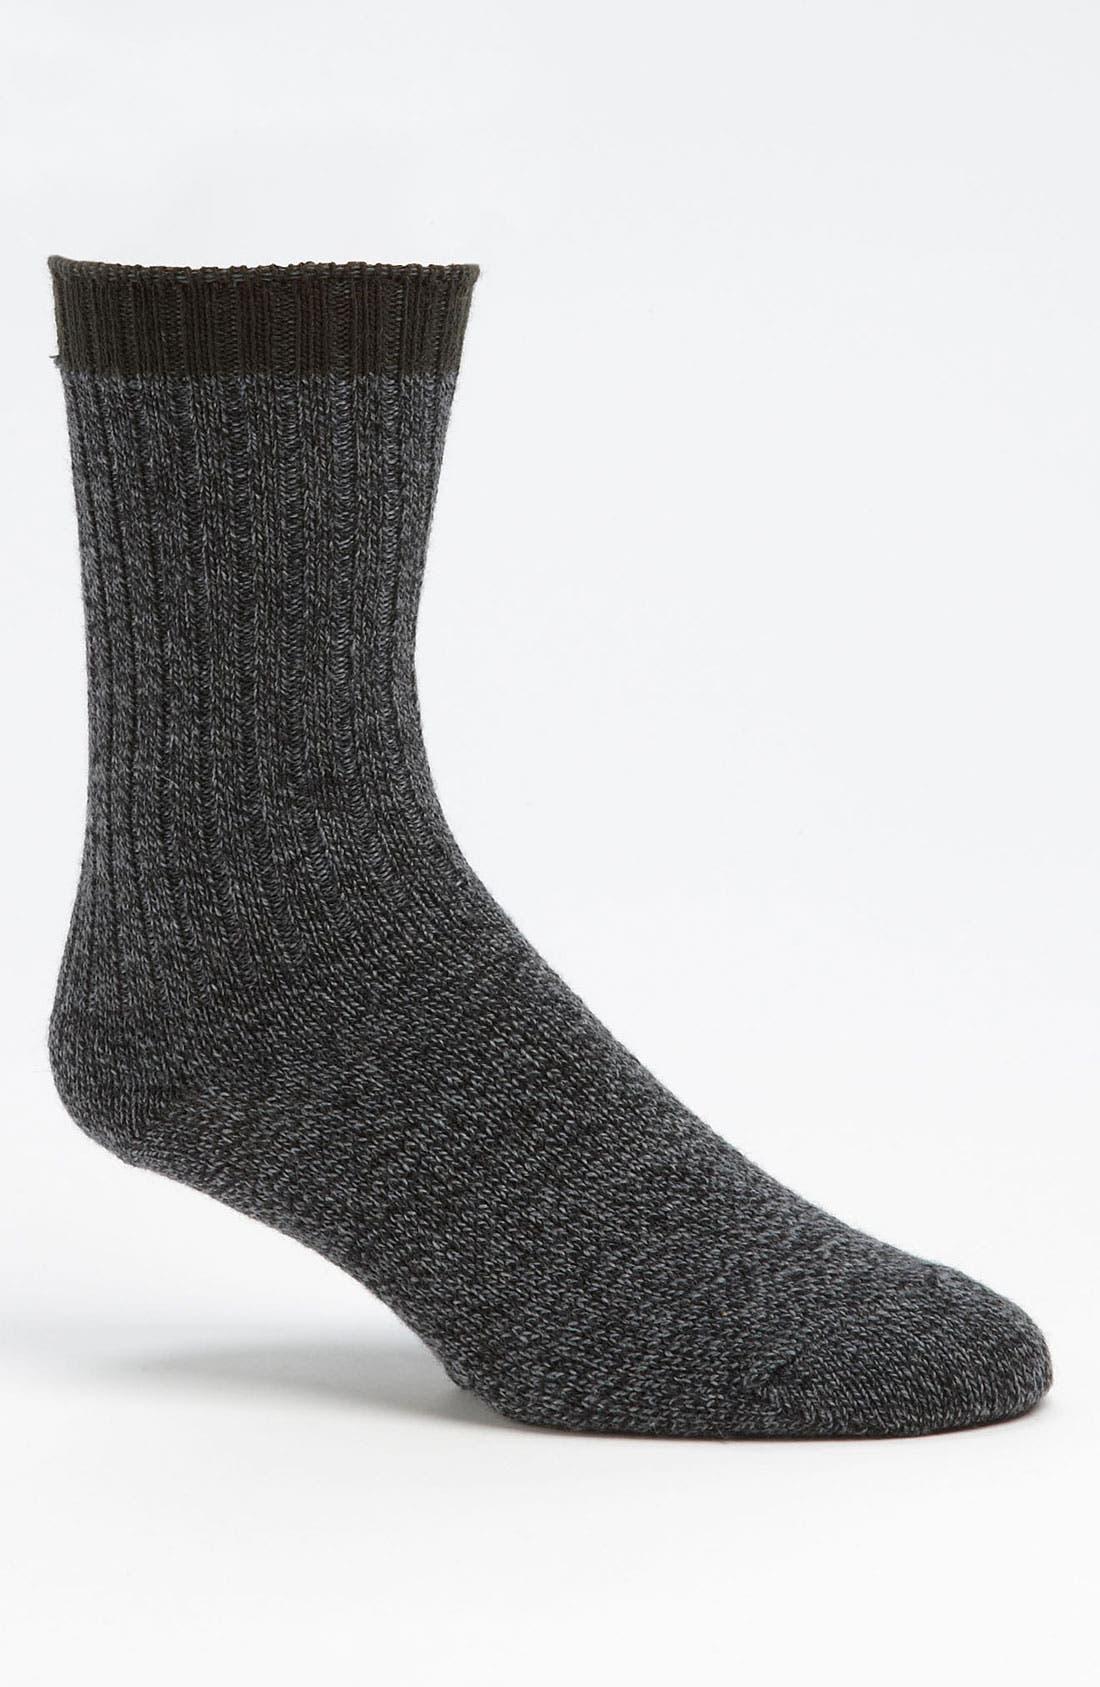 Main Image - Smartwool 'Adventurer' Socks